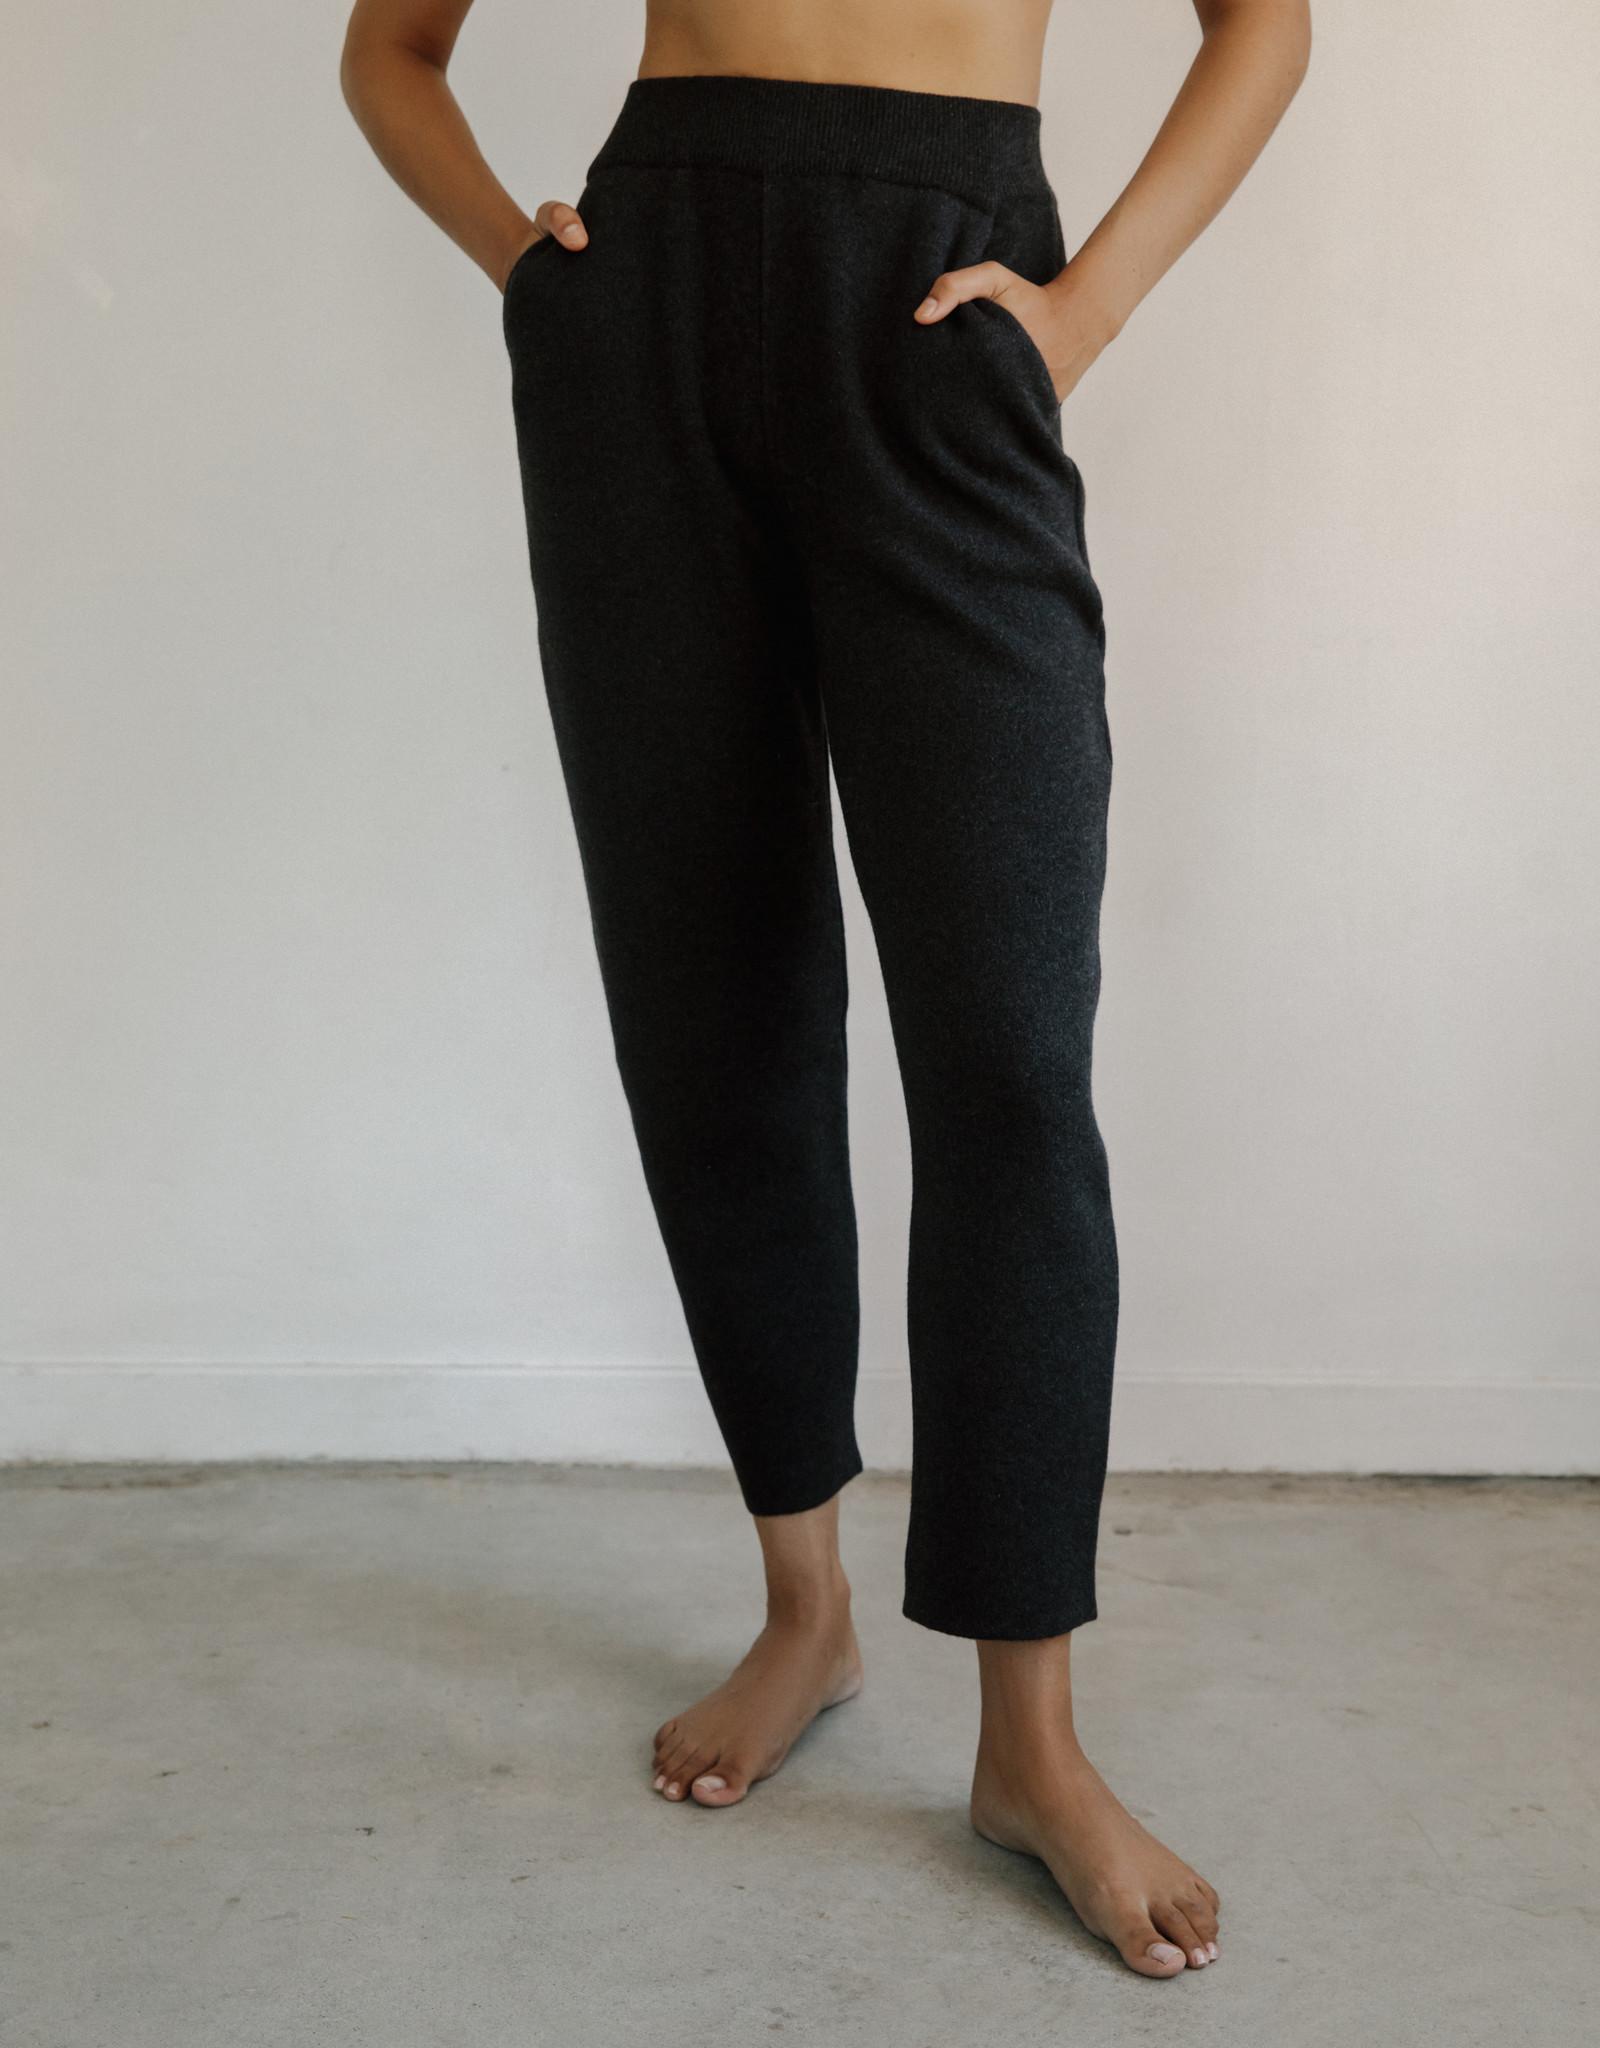 Bare Knitwear xs-s Graphite Lounge Pant